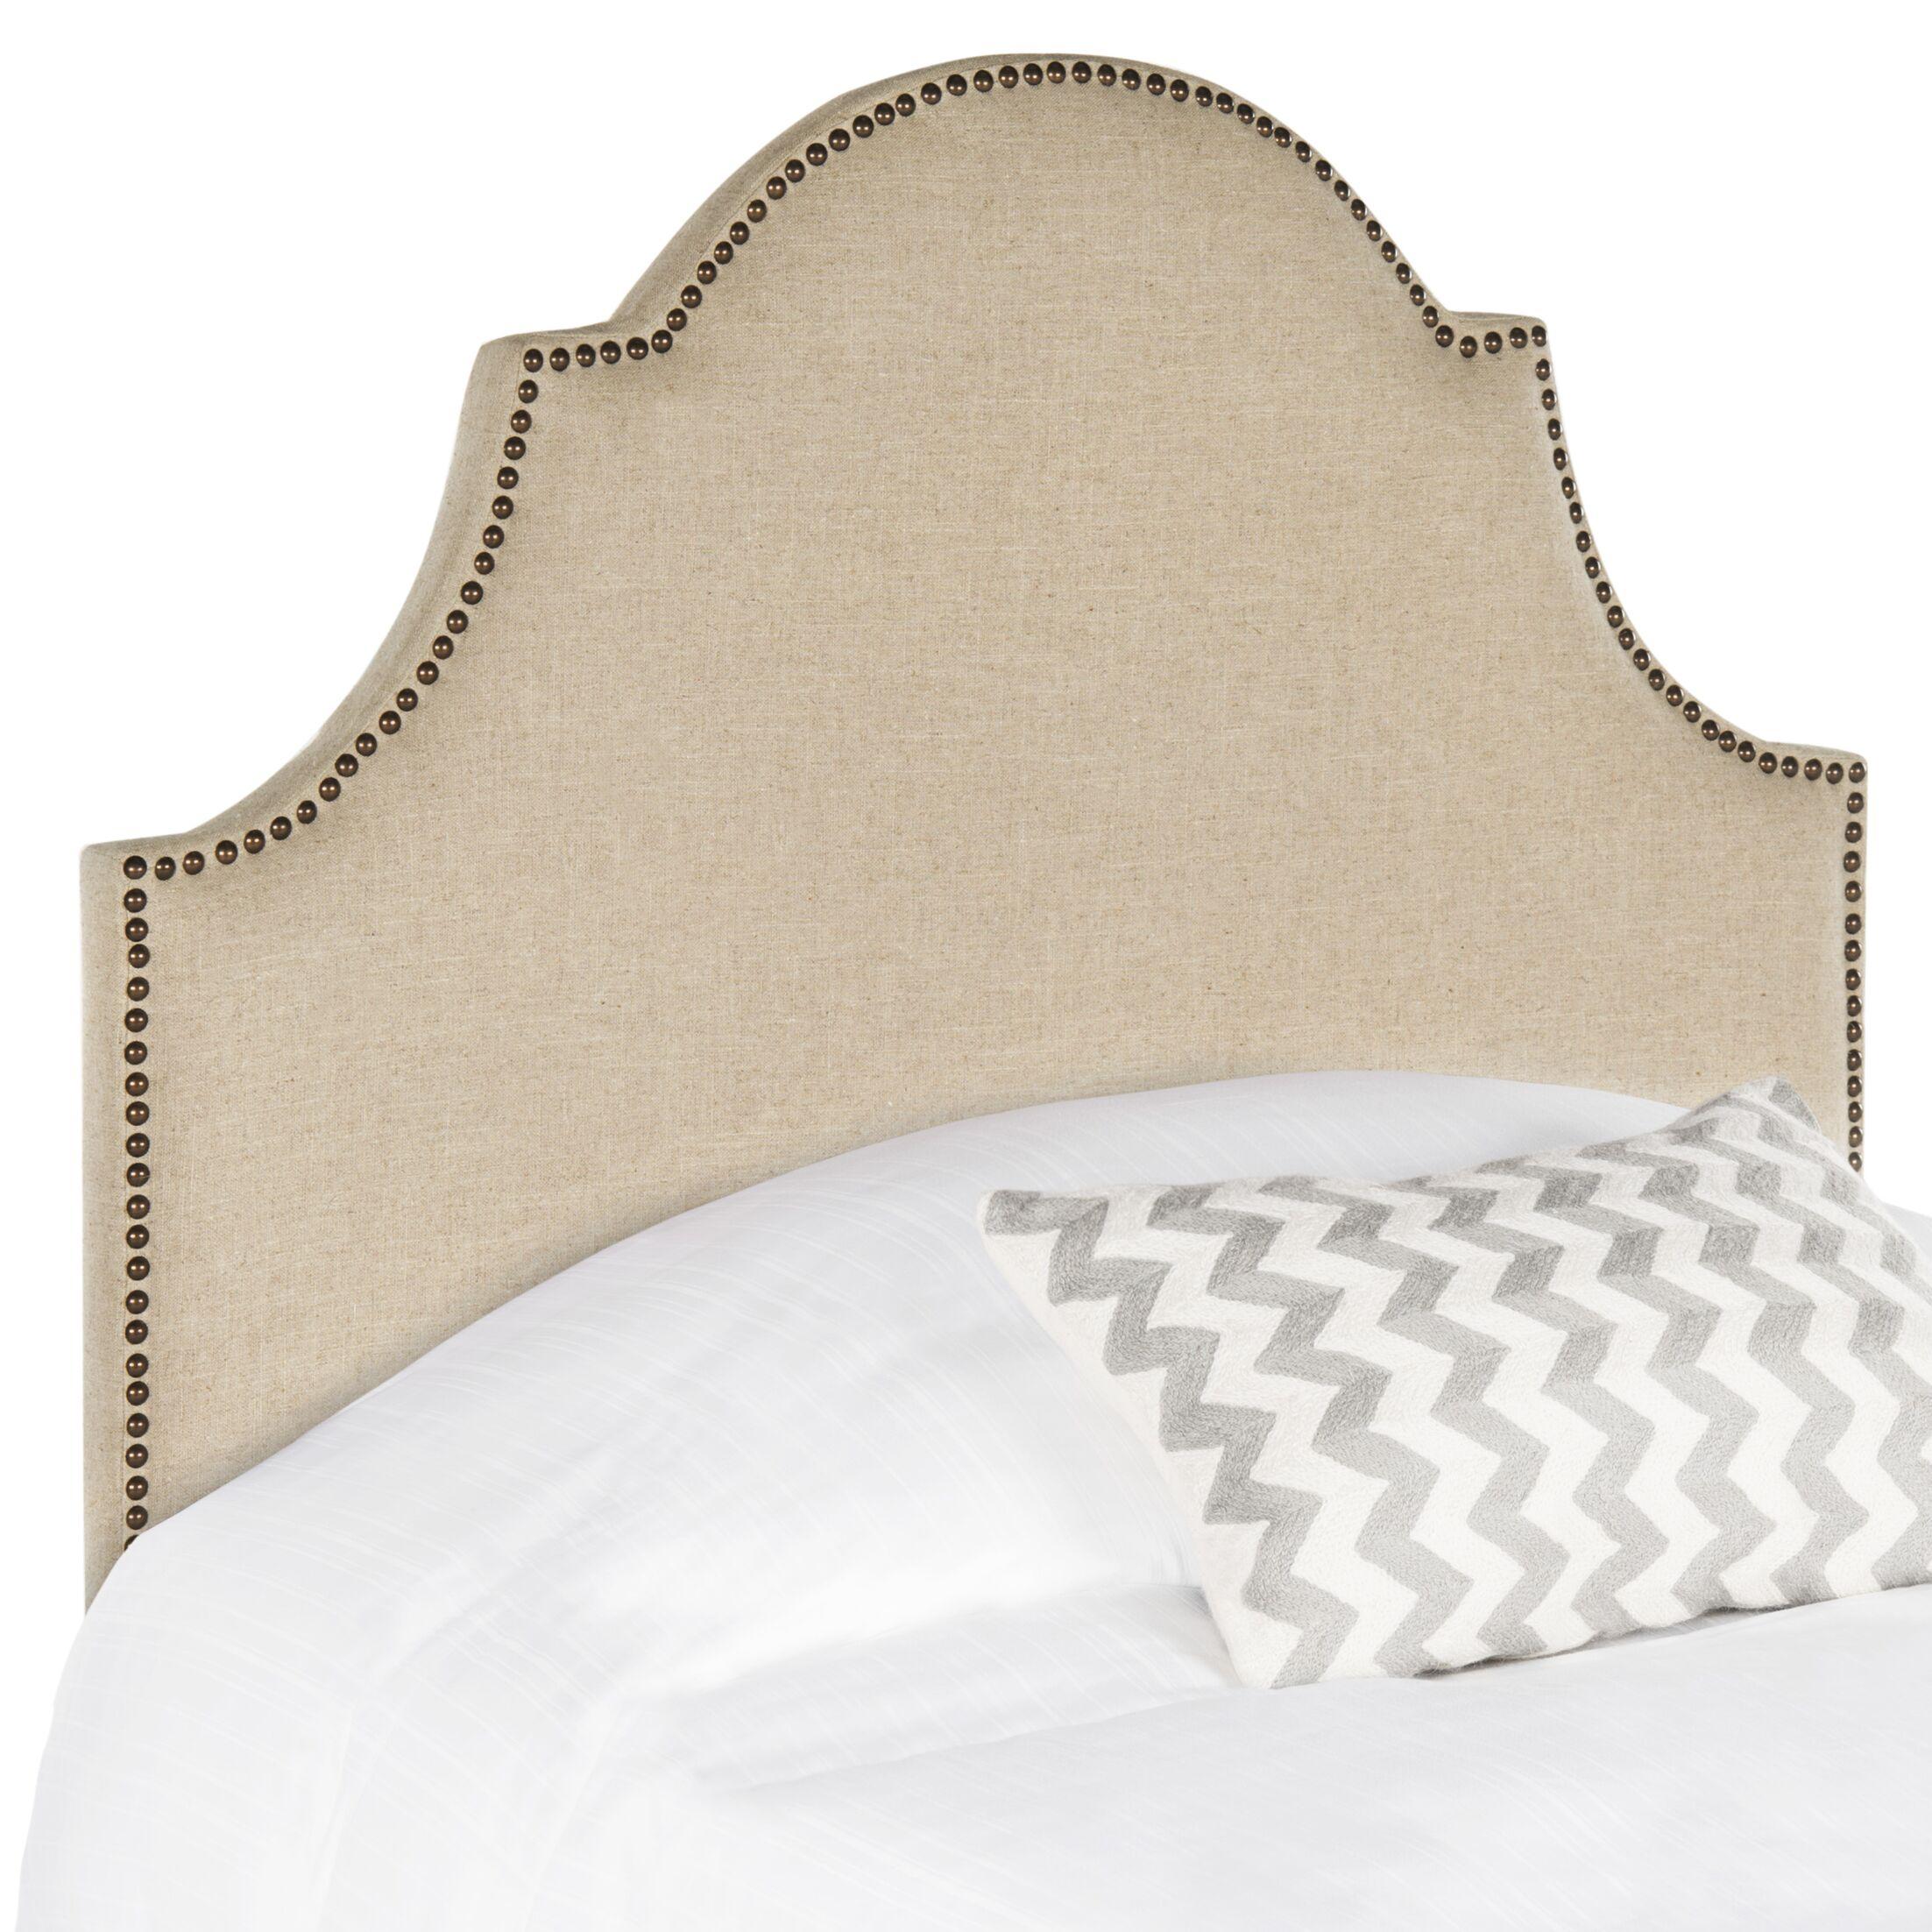 Caswell Upholstered Panel Headboard Size: Full